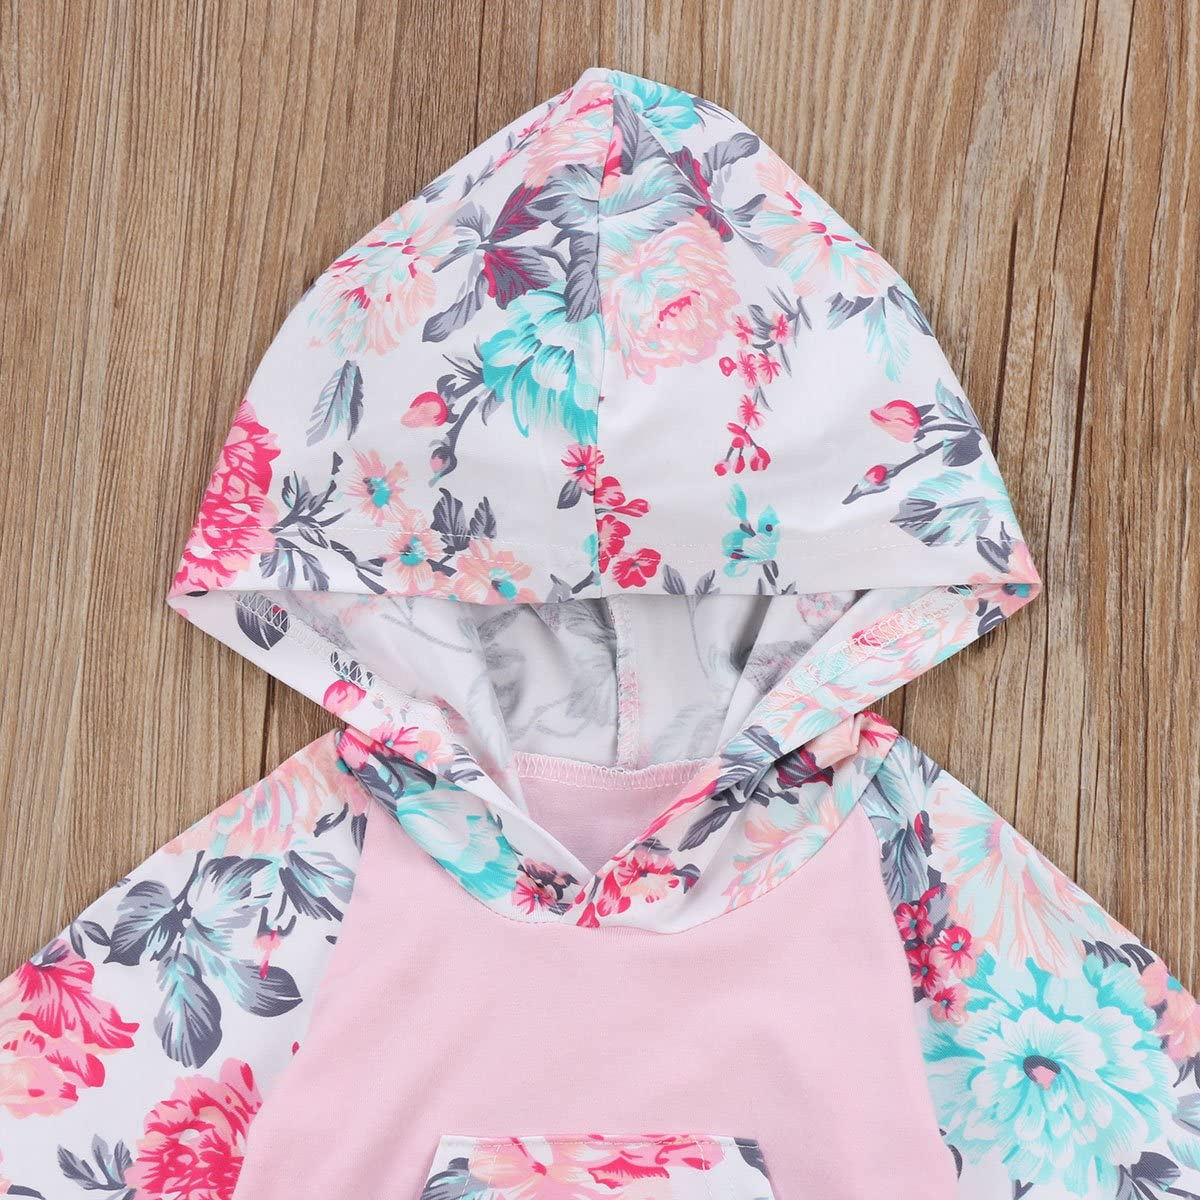 Floral Pant Set Leggings 2 Piece Outfits 6M-3Y Baby Girls Floral Hoodie